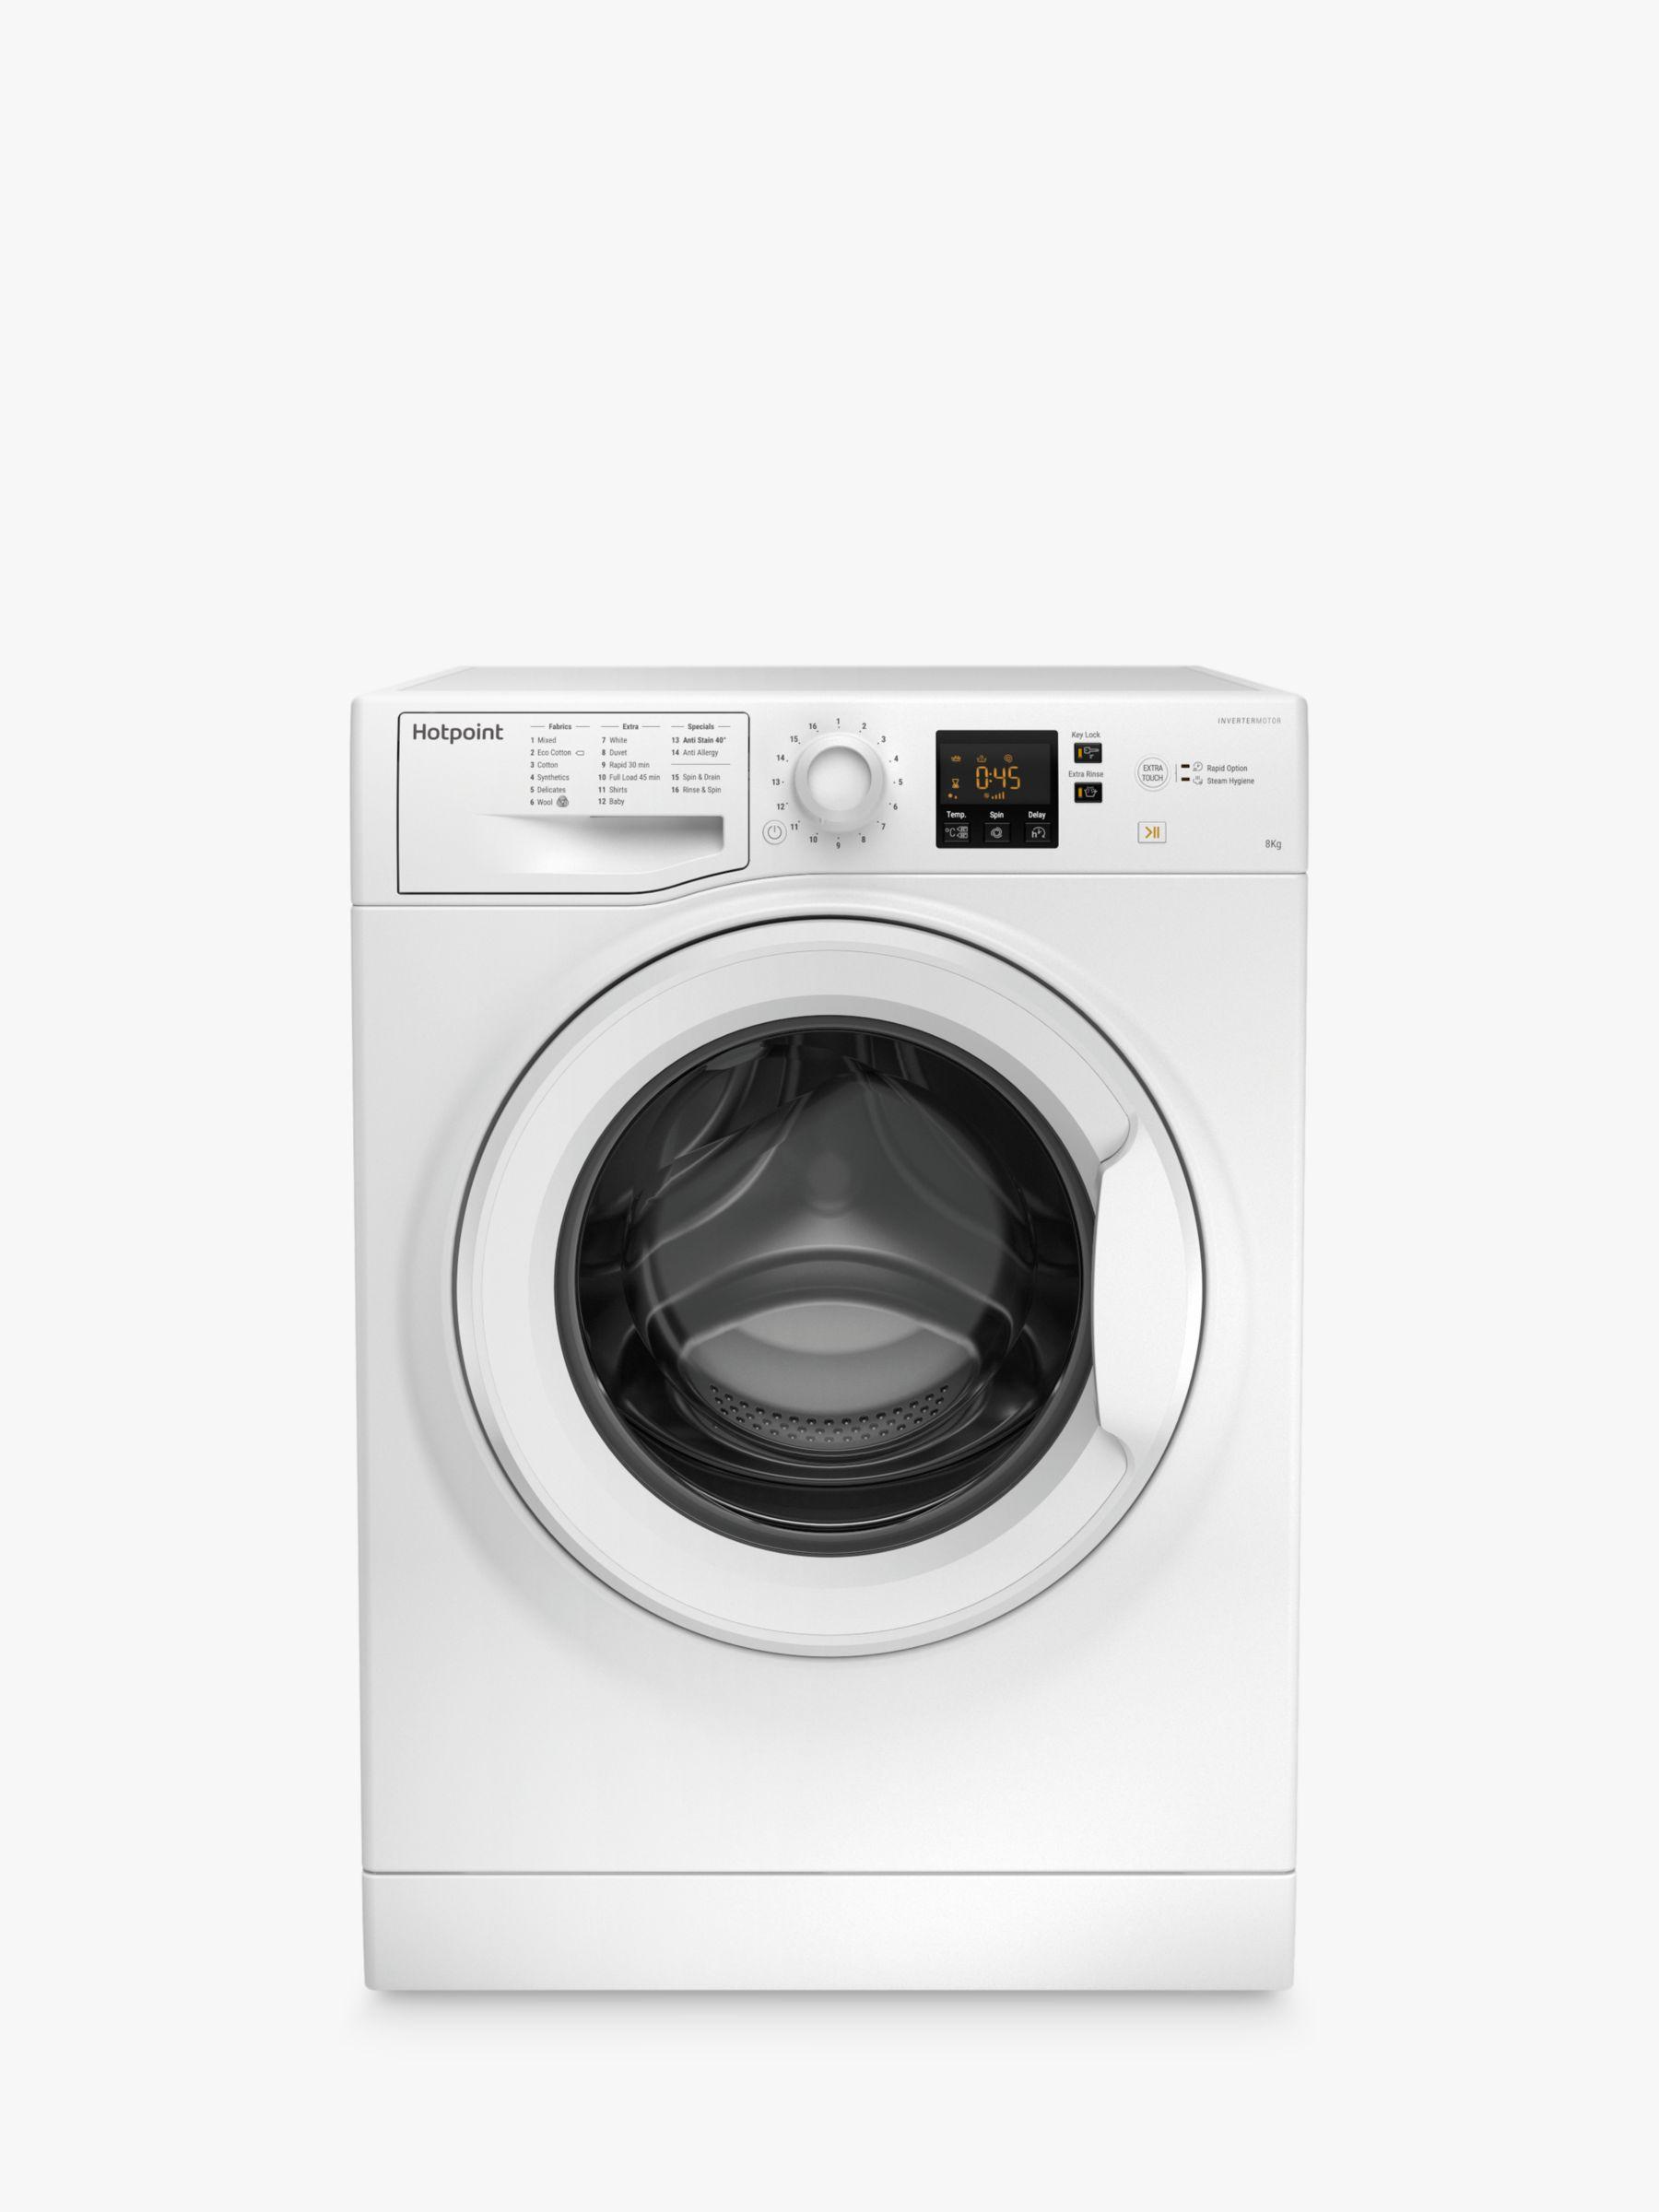 Hotpoint Hotpoint NSWJ842UW Freestanding Washing Machine, 8kg Load, 1400rpm, A++ Energy Rating, White